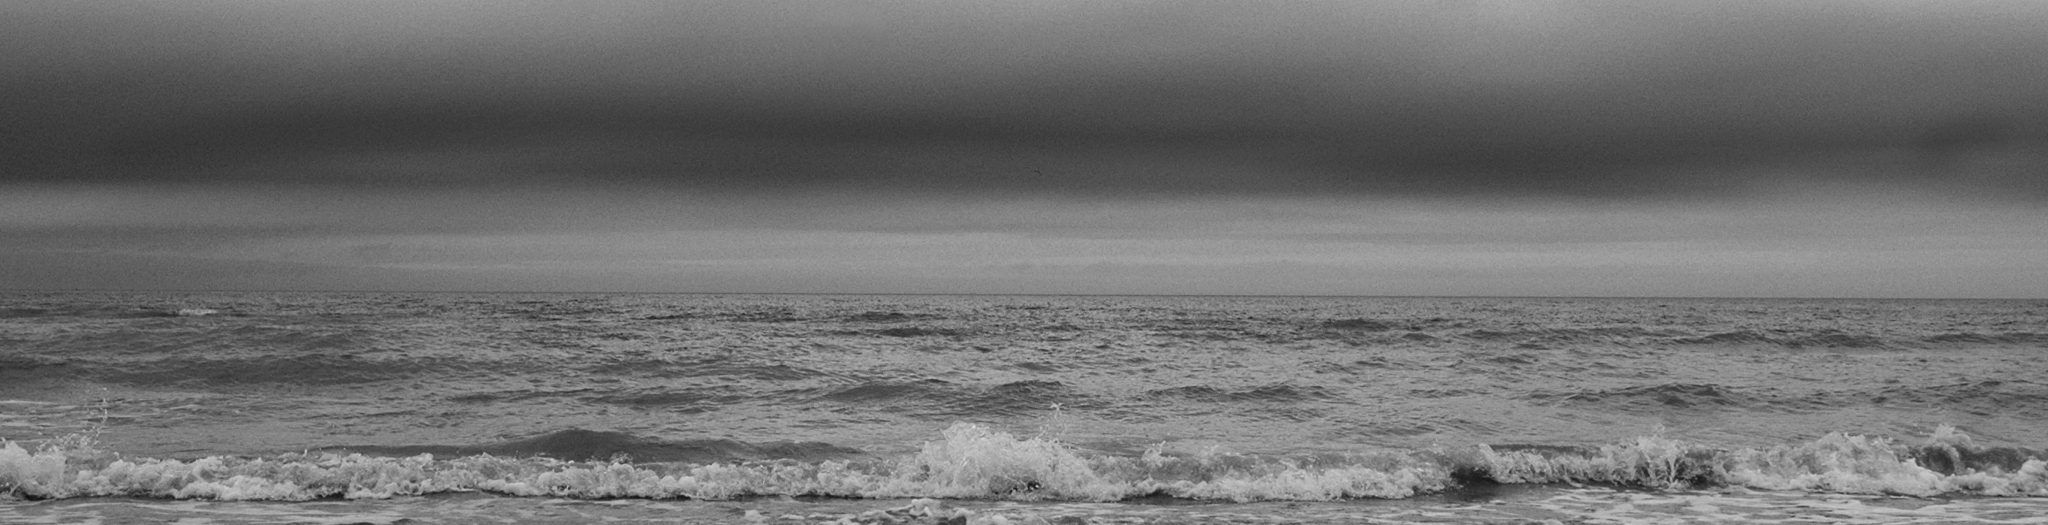 storm-op-komst_fred-de-krom-fotografie-en-beeldbewerking_2